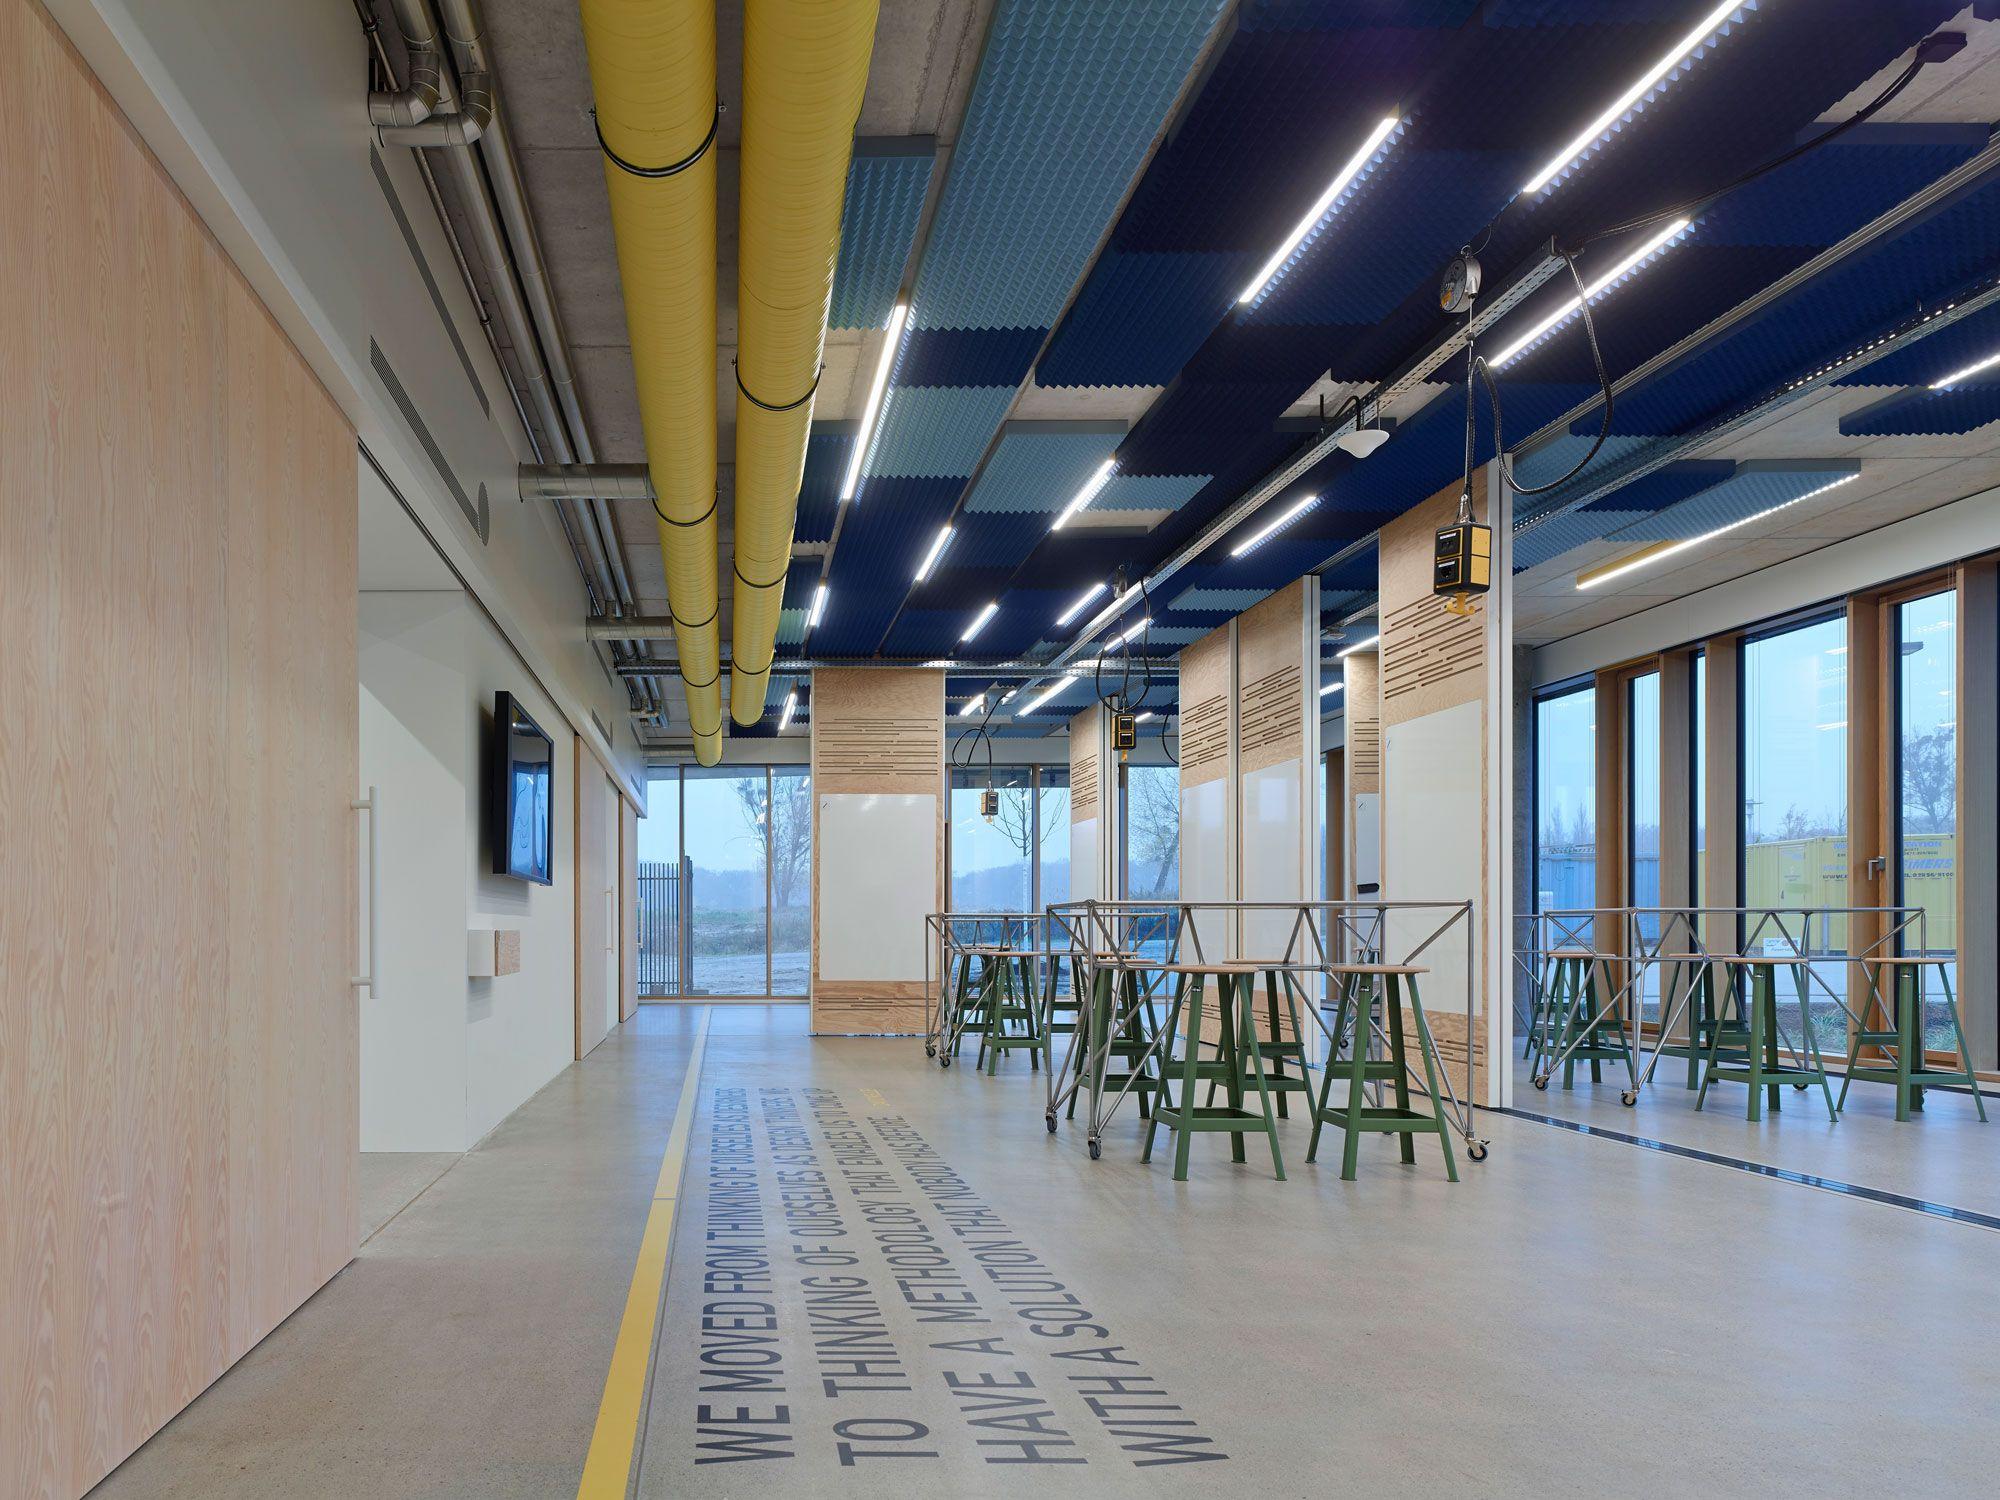 Sap Innovation Center Potsdam 23 Workplace In 2019